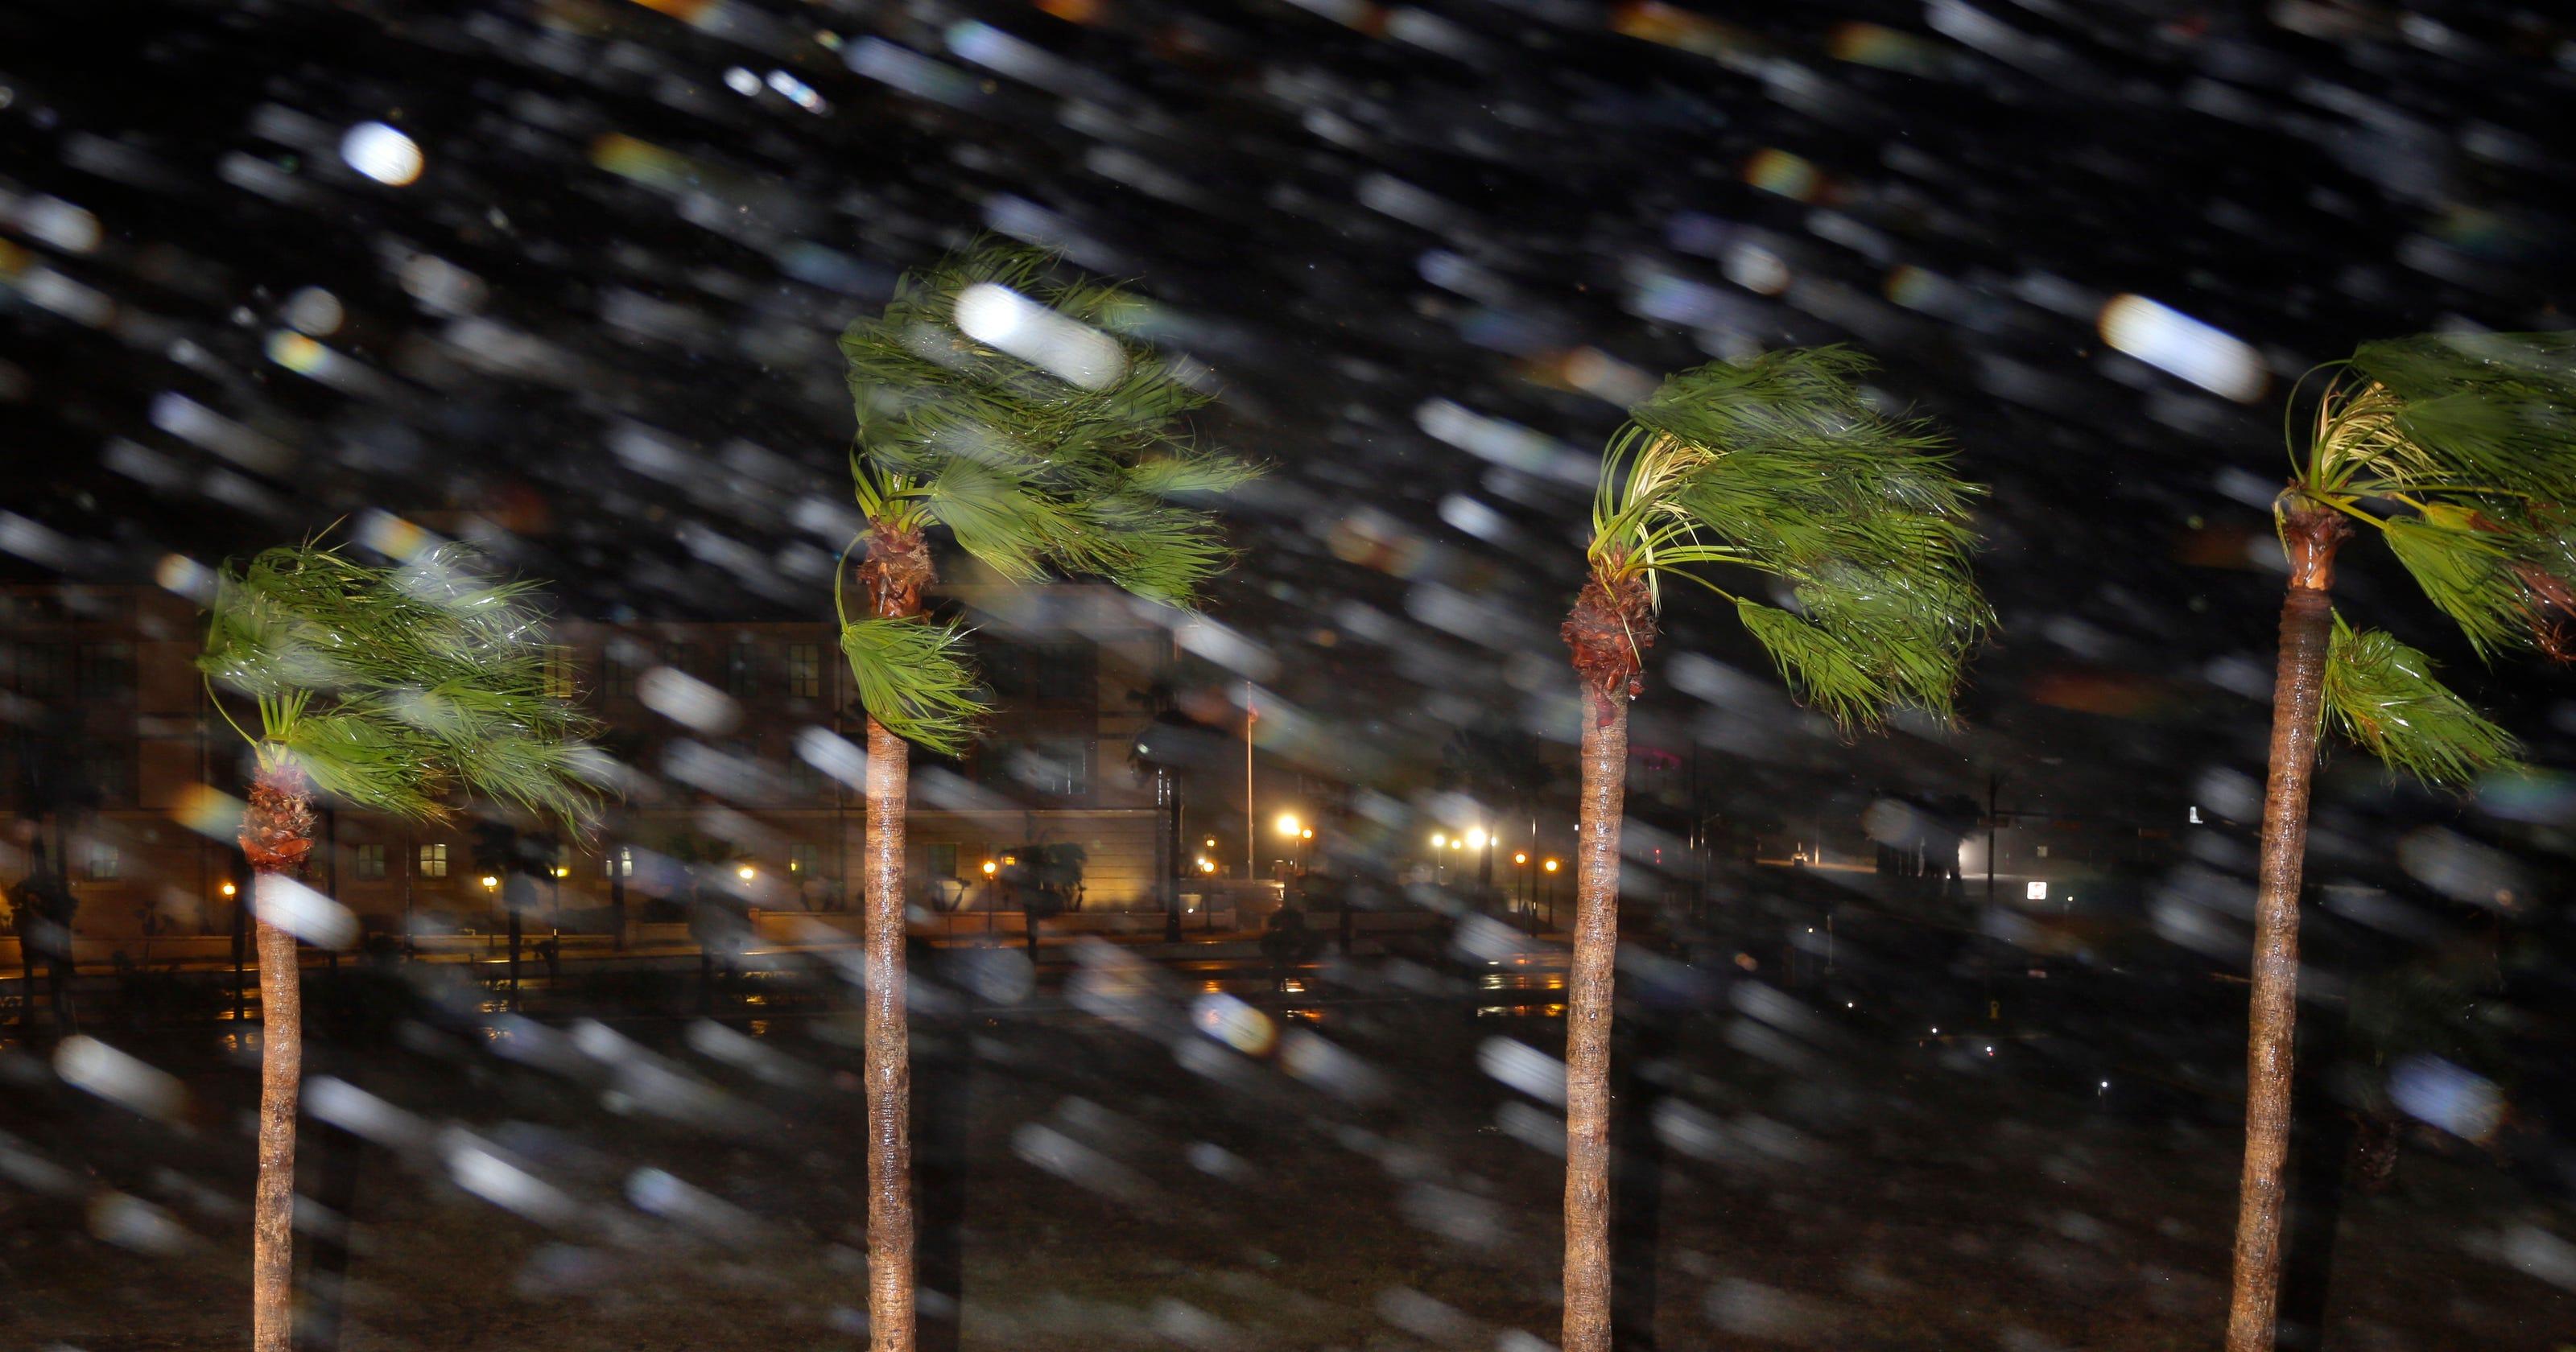 Hurricane Harvey pounds Texas, downgraded to Category 2 storm